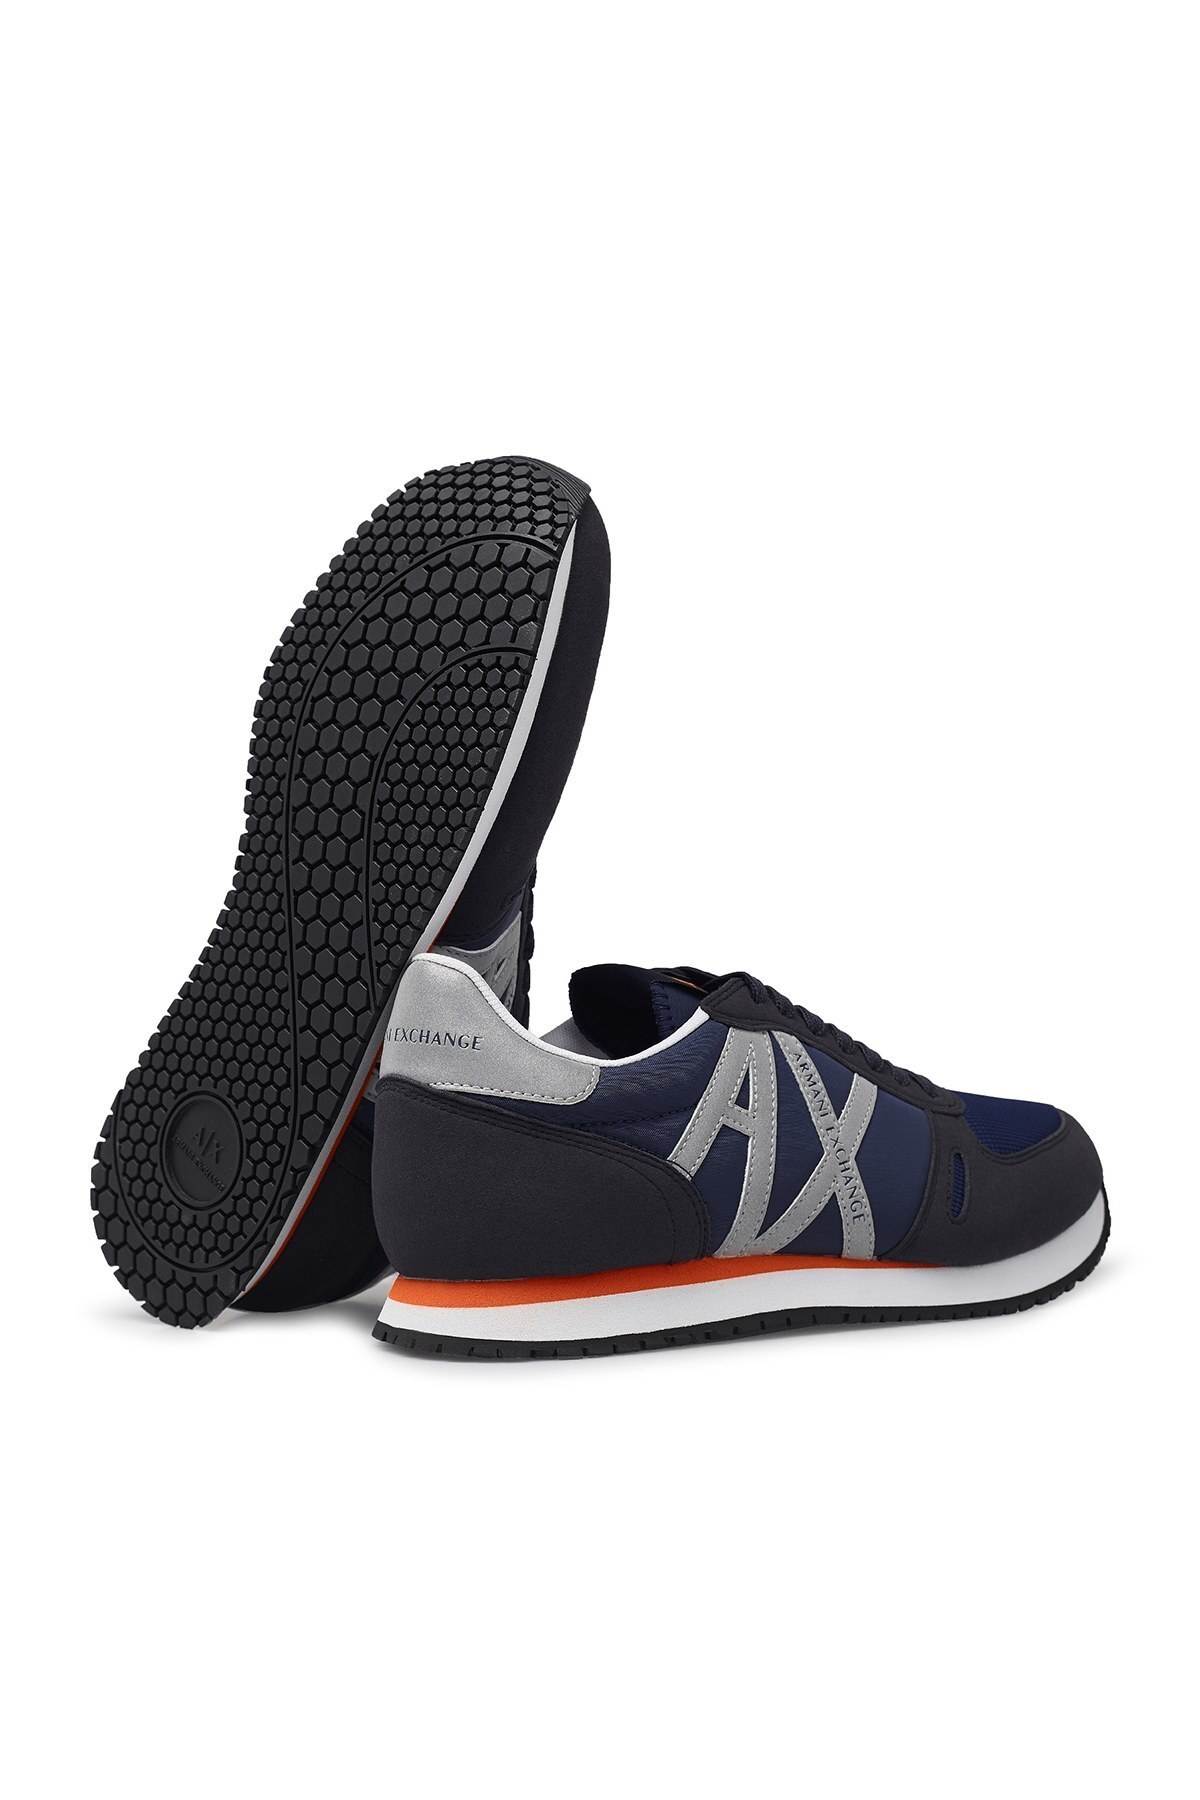 Armani Exchange Erkek Ayakkabı XUX017 XCC68 K499 LACİVERT-GRİ